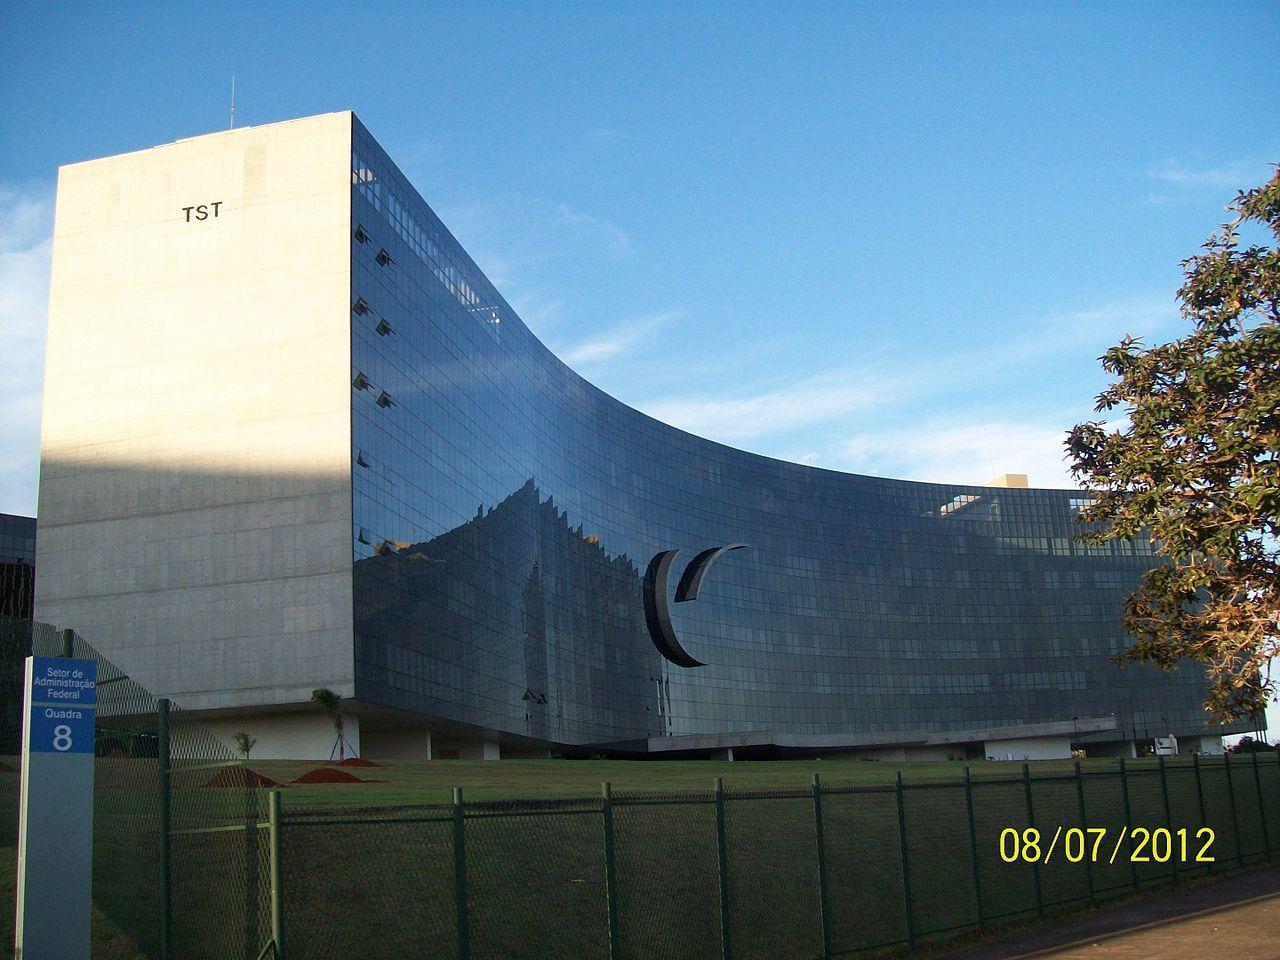 Brasilia_DF_Brasil_-_TST,_Tribunal_Superior_do_Trabalho_-_panoramio.jpg